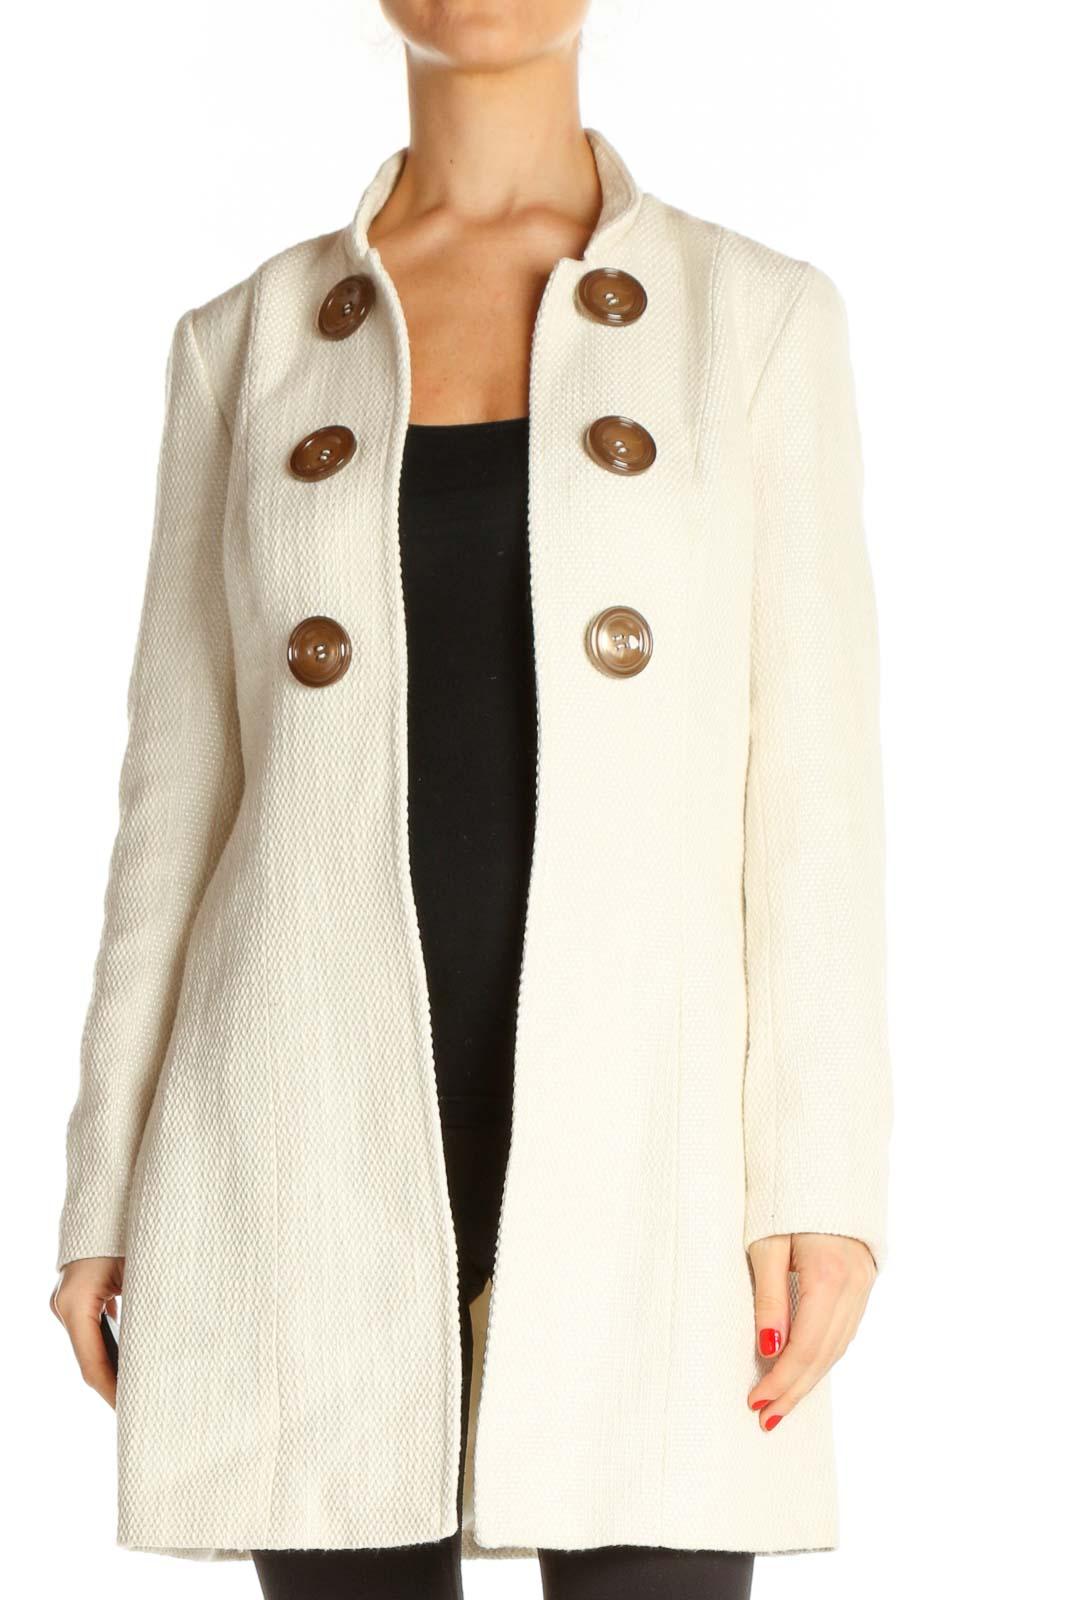 Beige Outerwear Coat Front